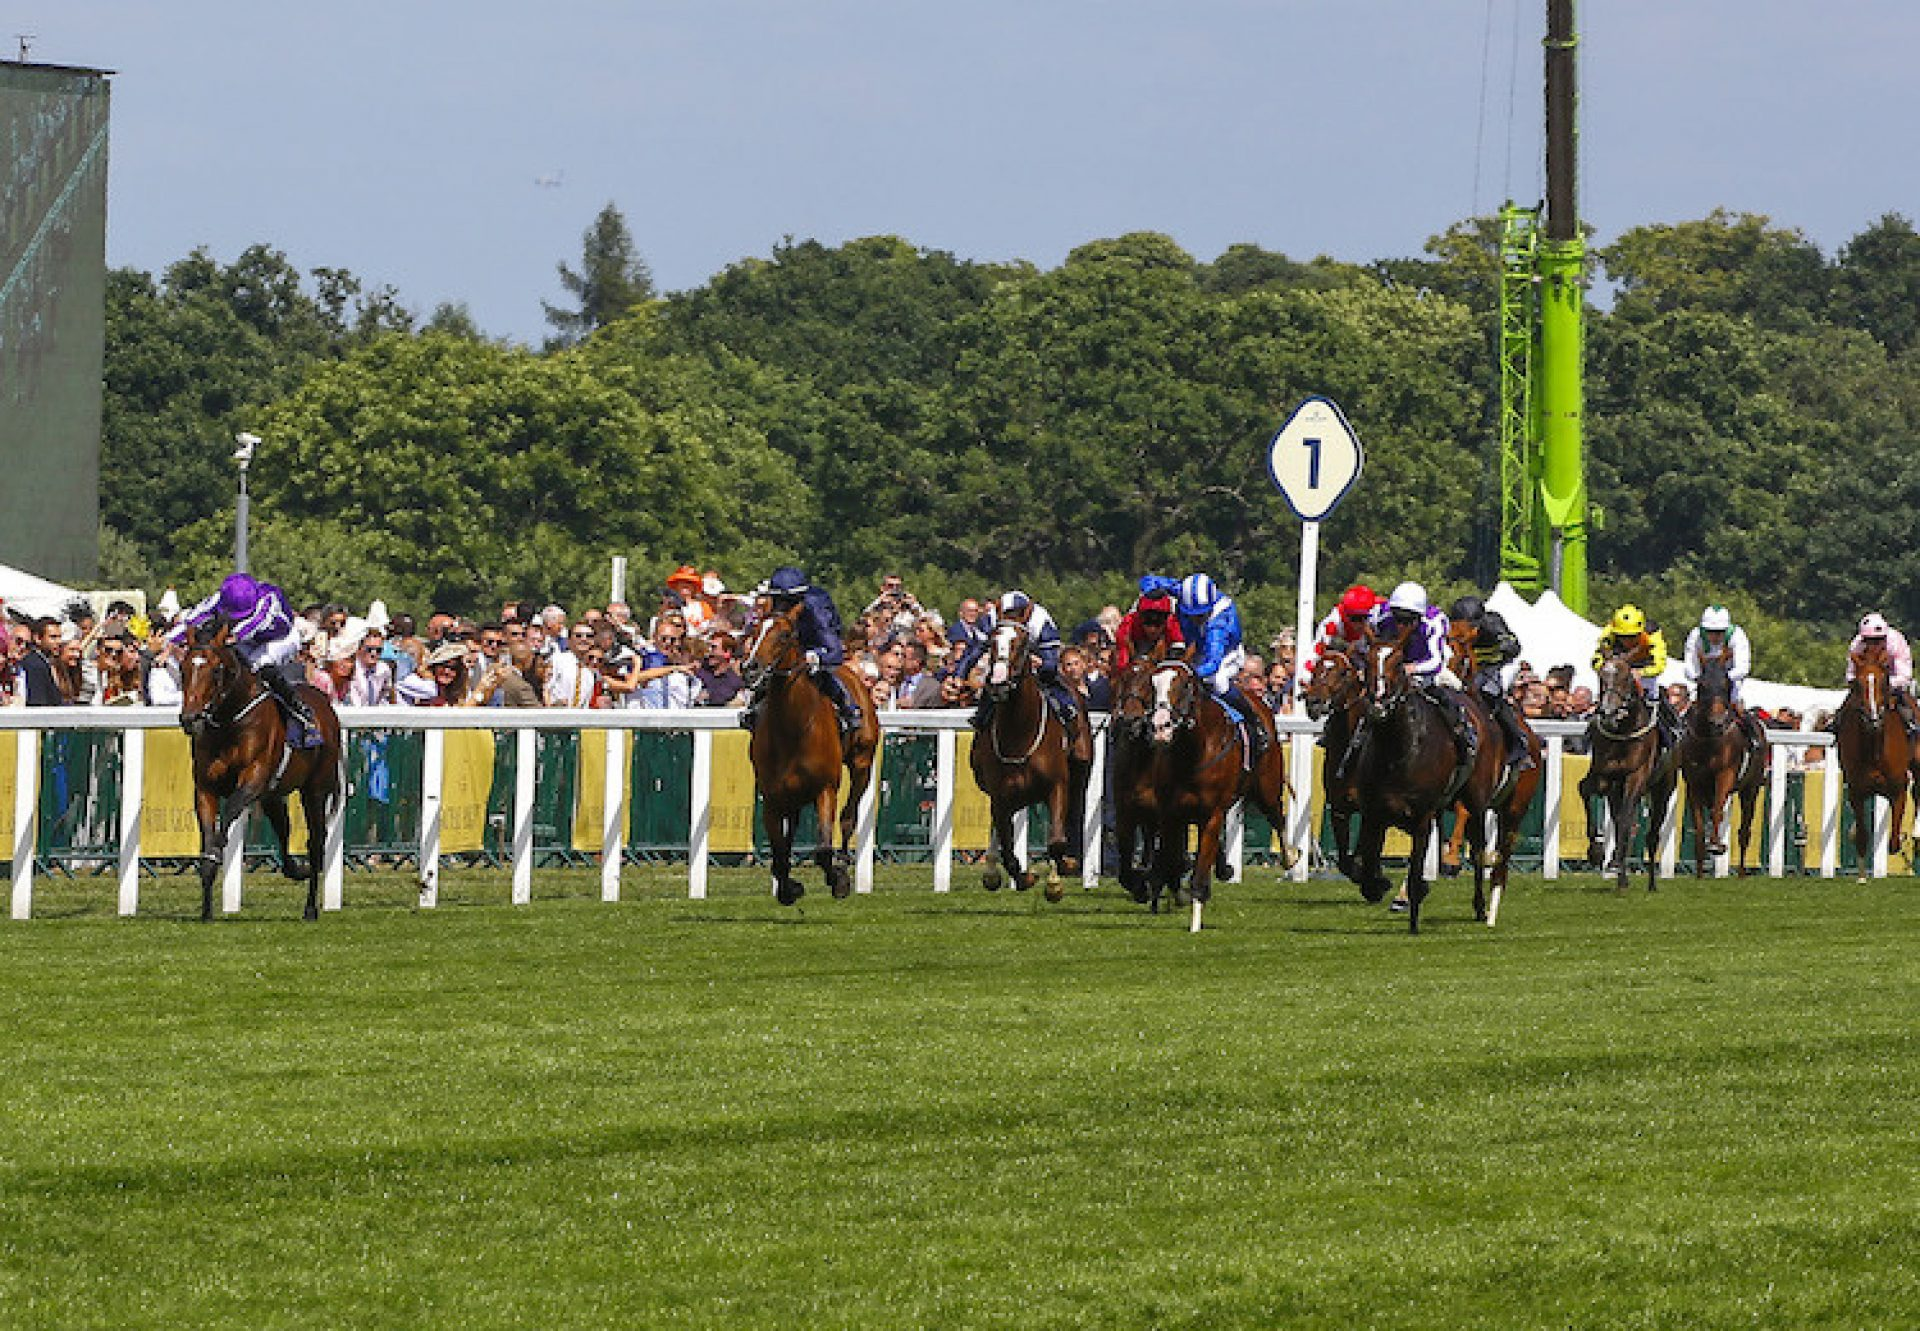 Purple Victory (War Command) winning a maiden at Saint-Cloud